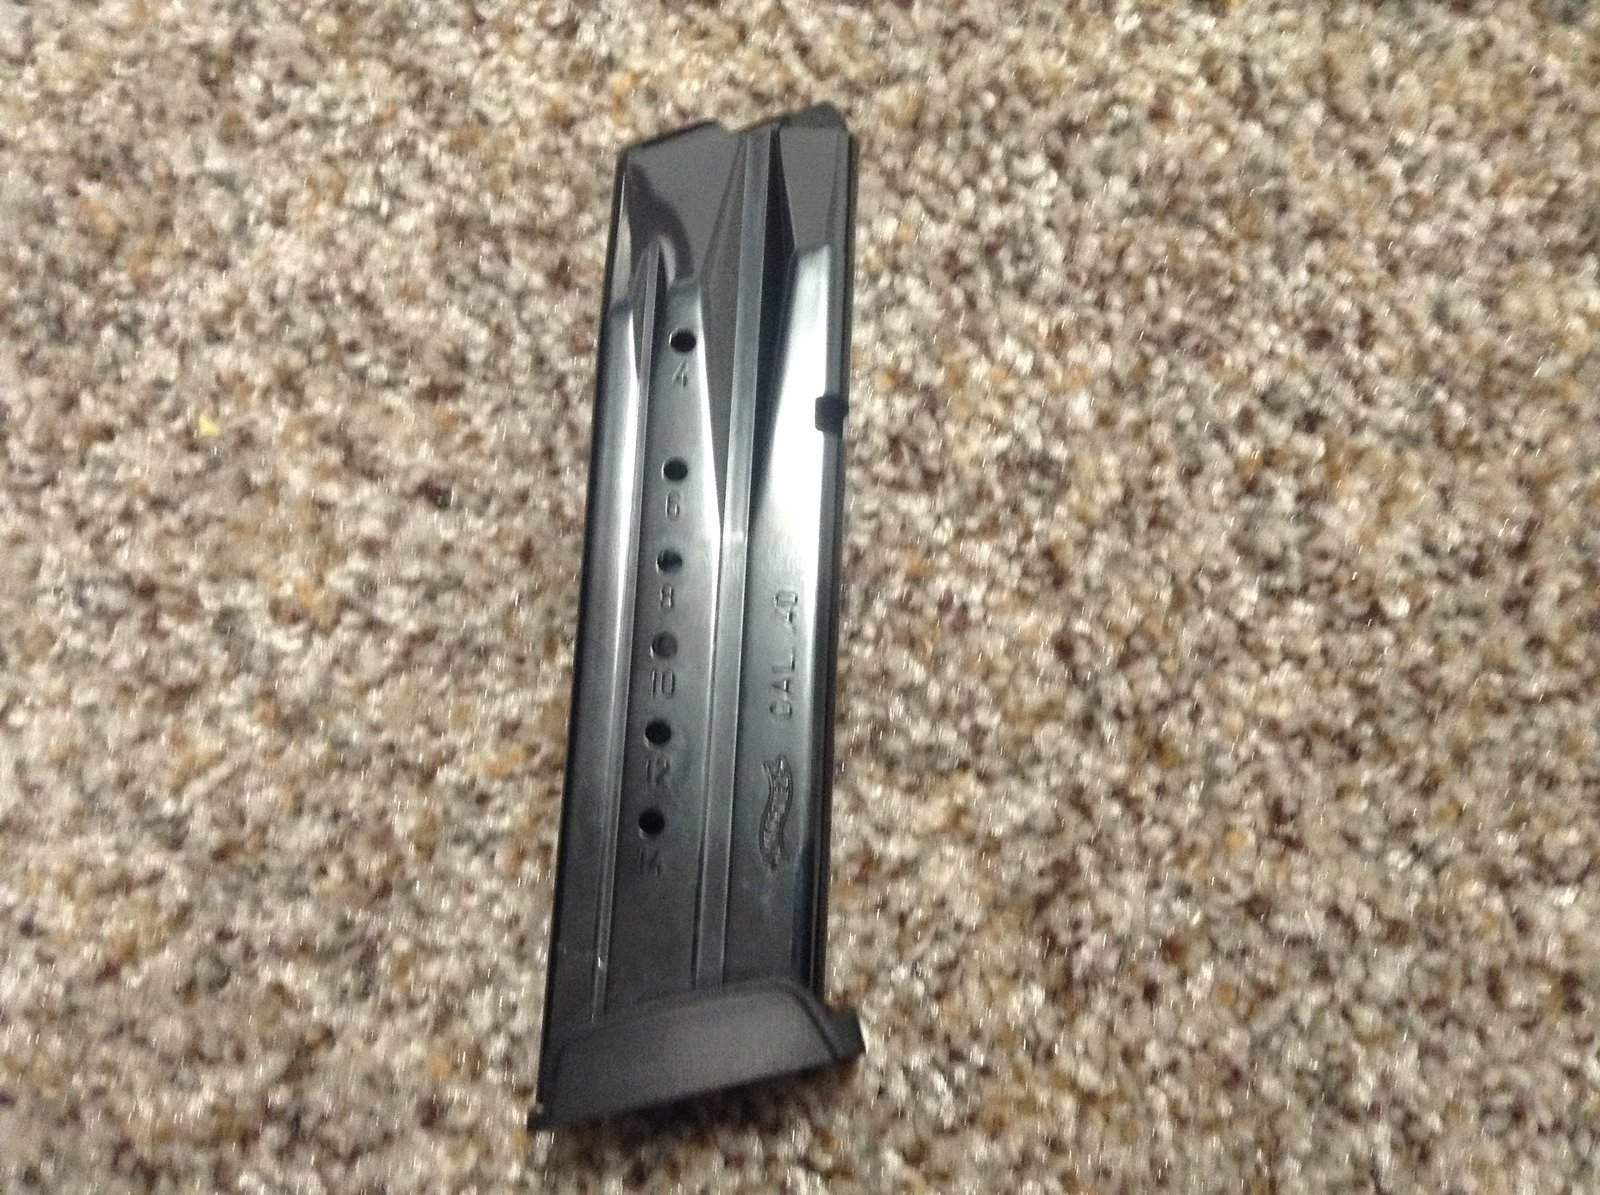 WTS/WTT OR - 5 Pistol Magazines: Walther PPX 40, Glock 45 GAP, Kahr